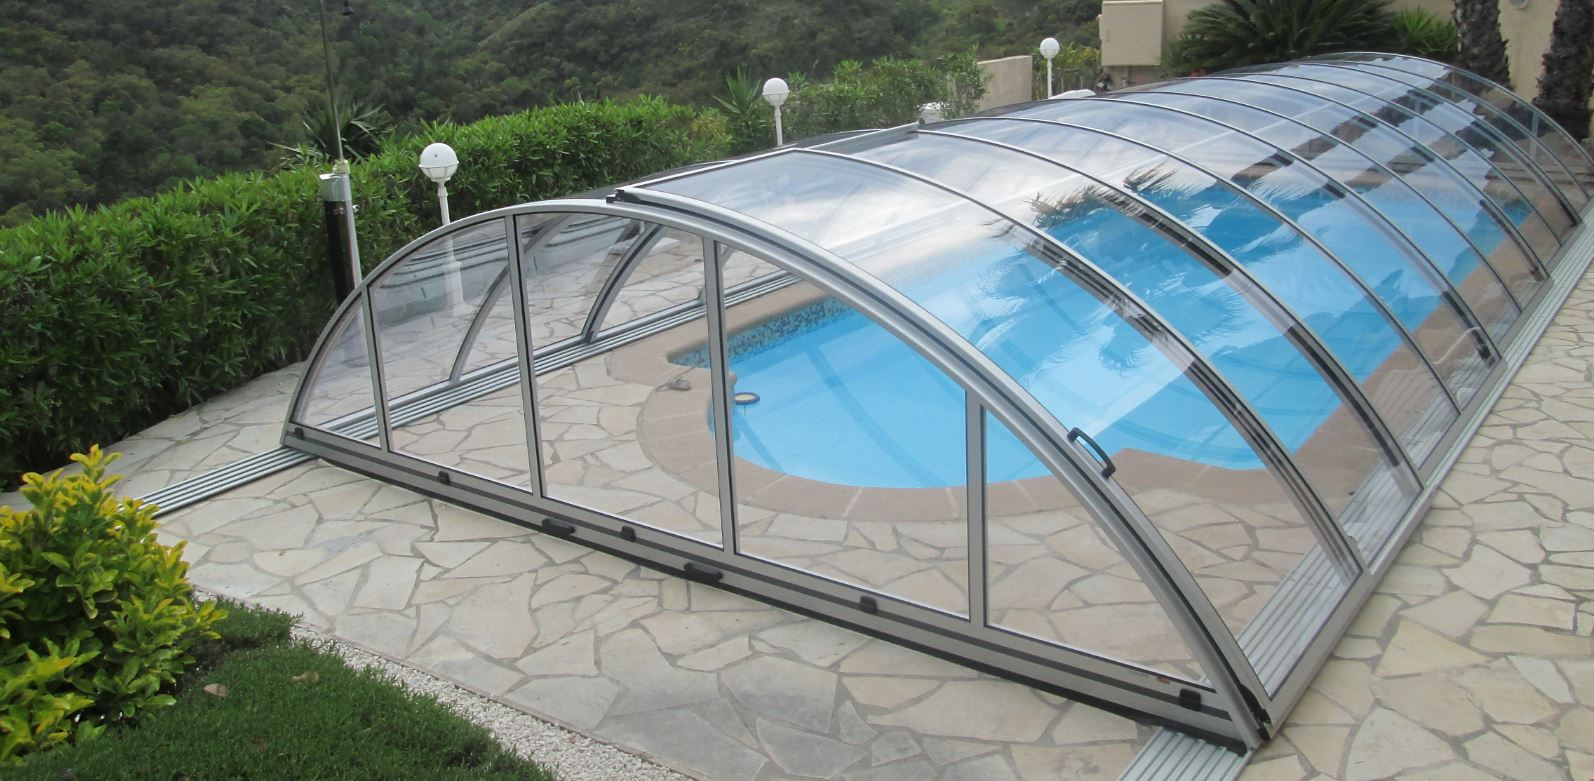 "<img src=""image.jpg"" alt=""swimming pool covers"">"